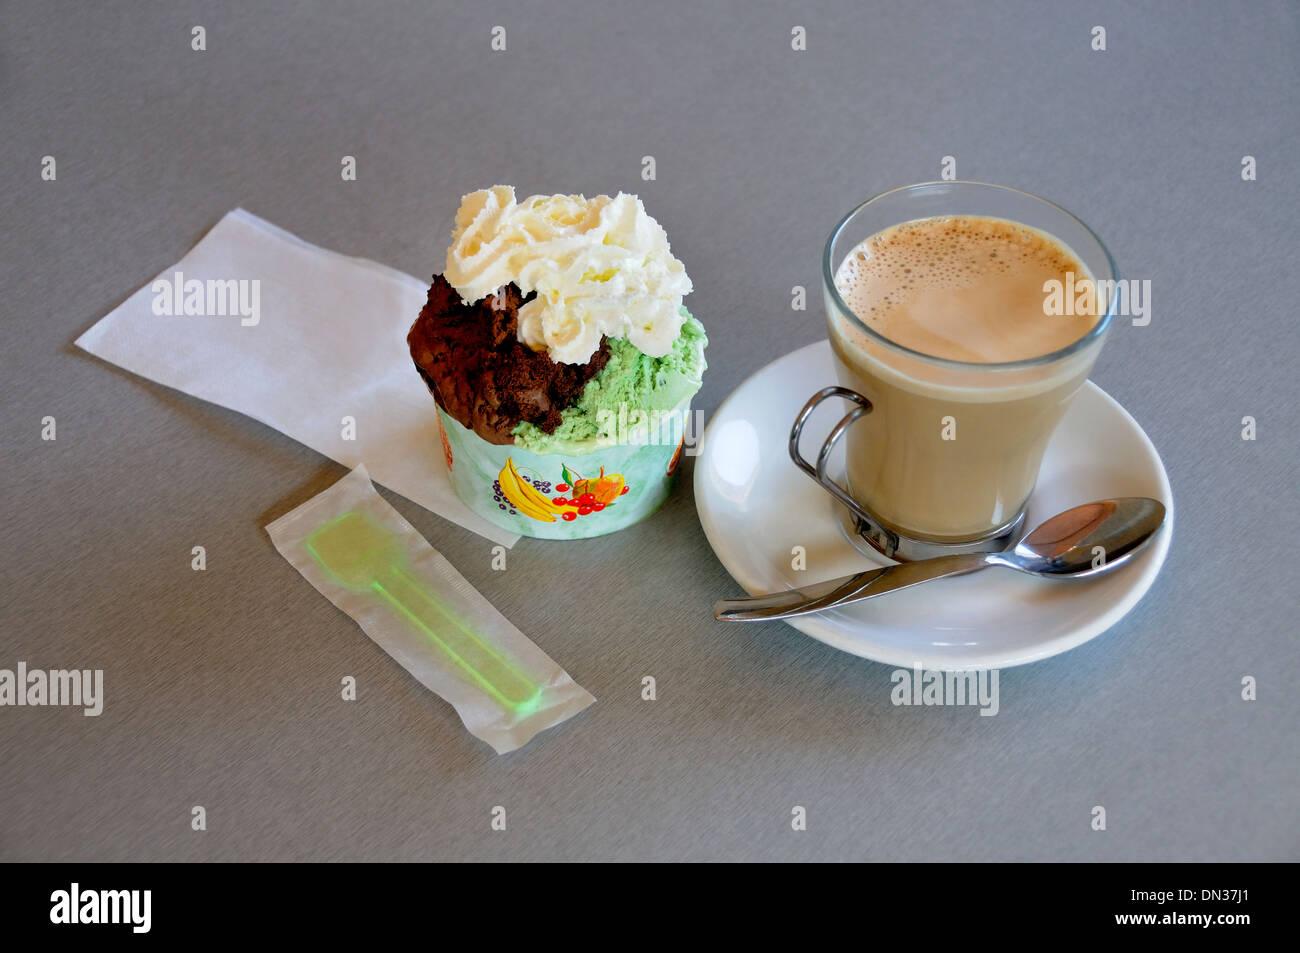 coffee and ice cream - Stock Image